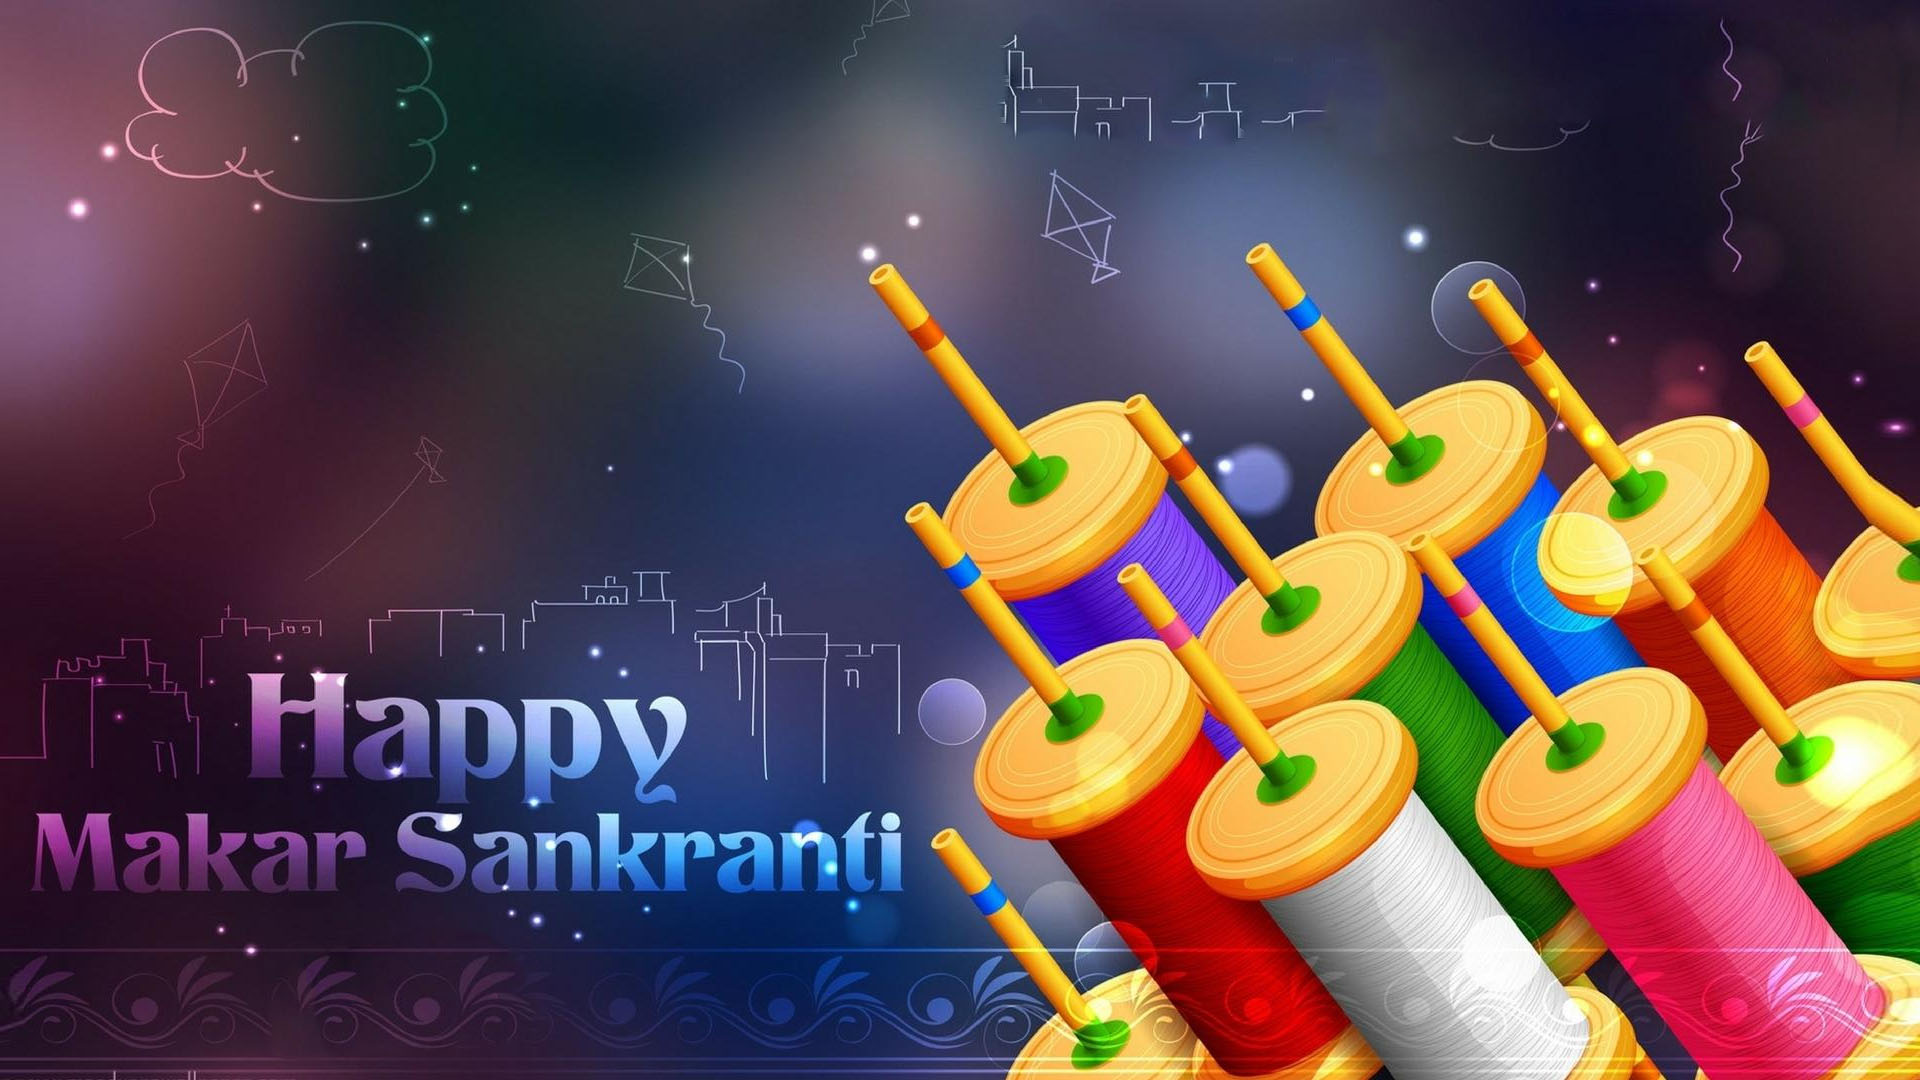 Wallpapers Of Makar Sankranti Festival In India